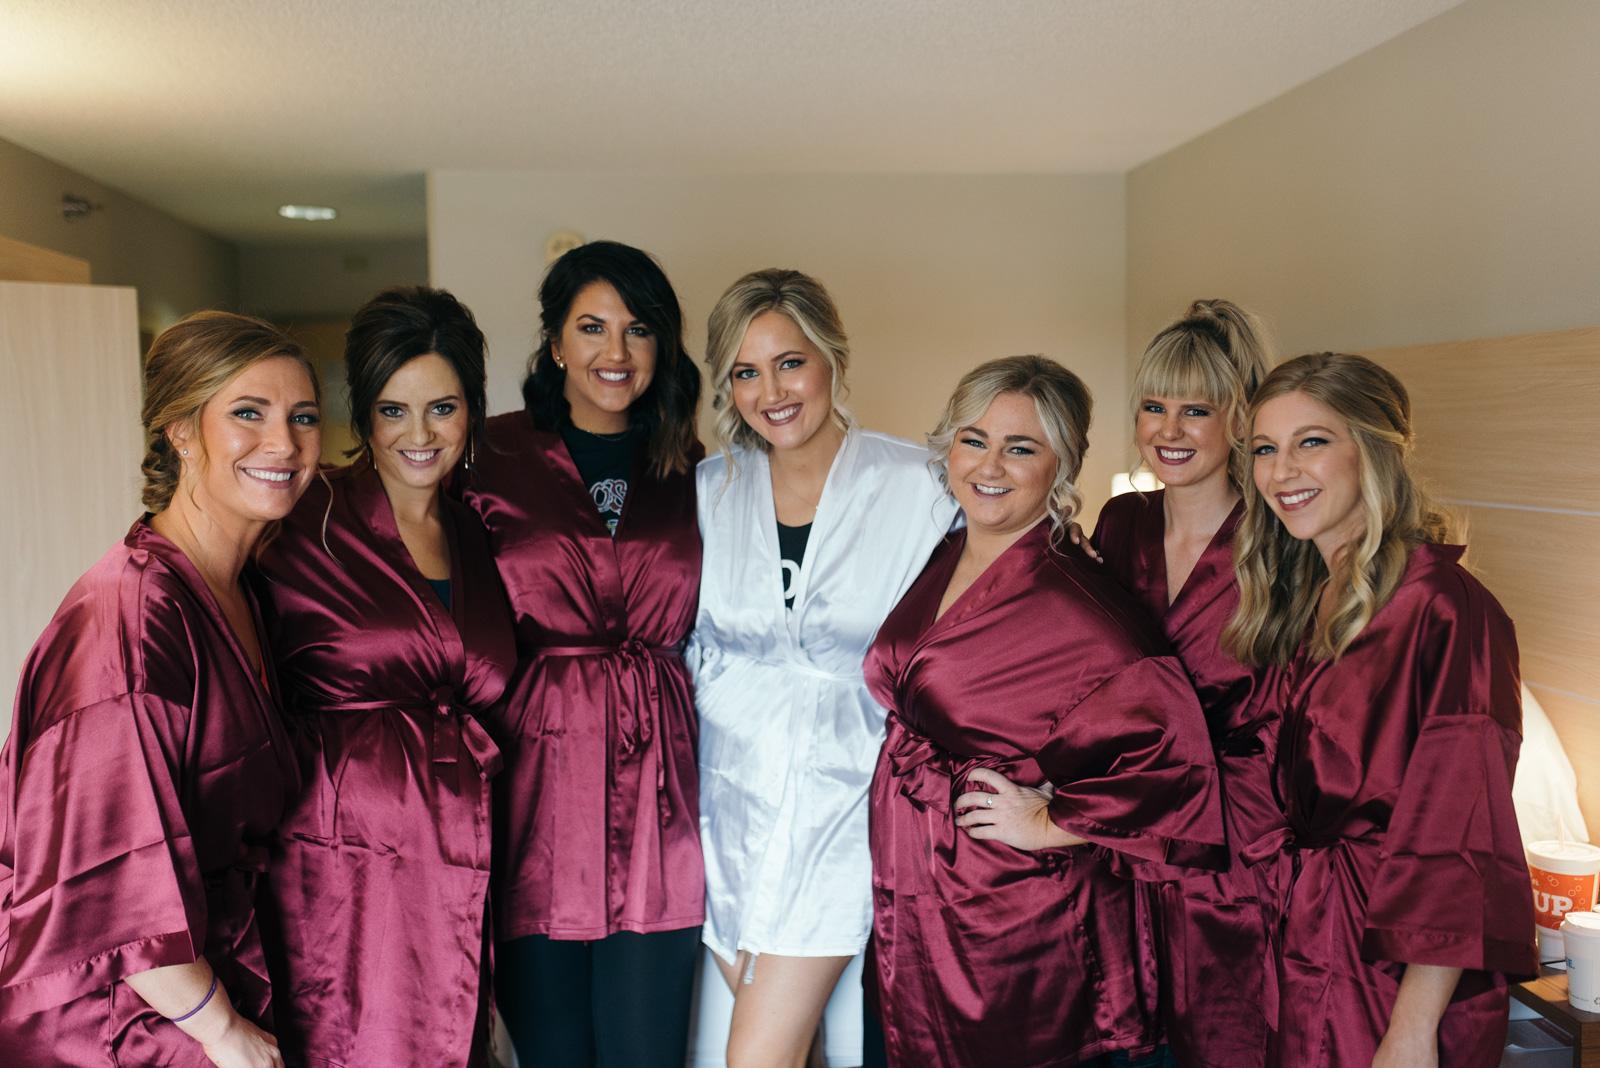 bride and bridesmaids in wedding robes